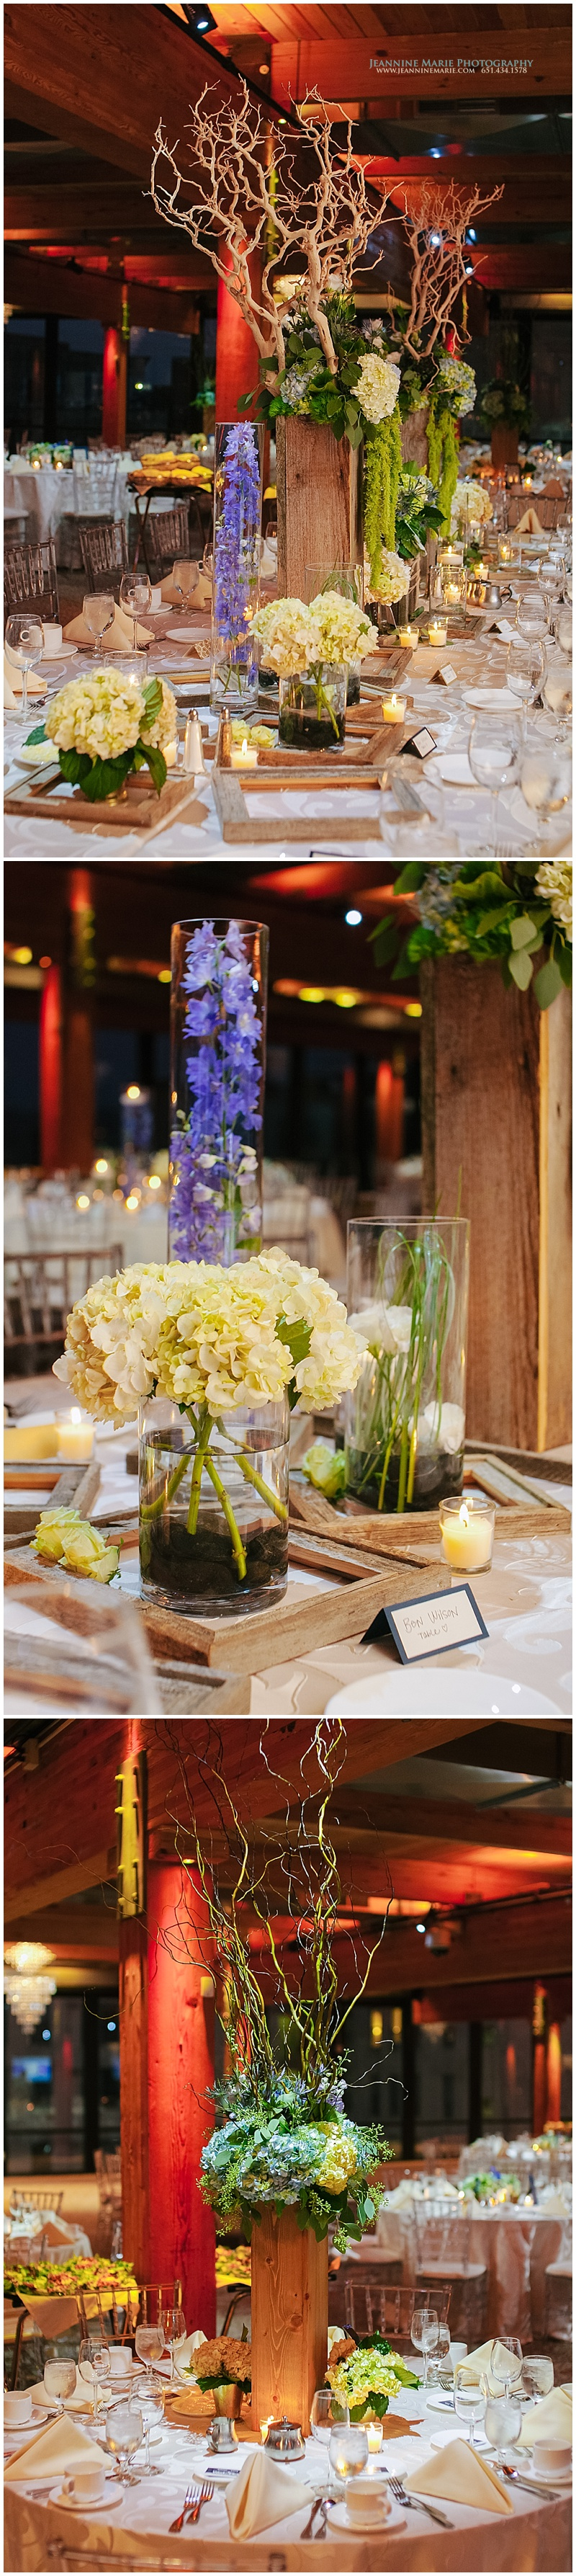 Wedding reception guest table centerpieces at Au0027BULAE